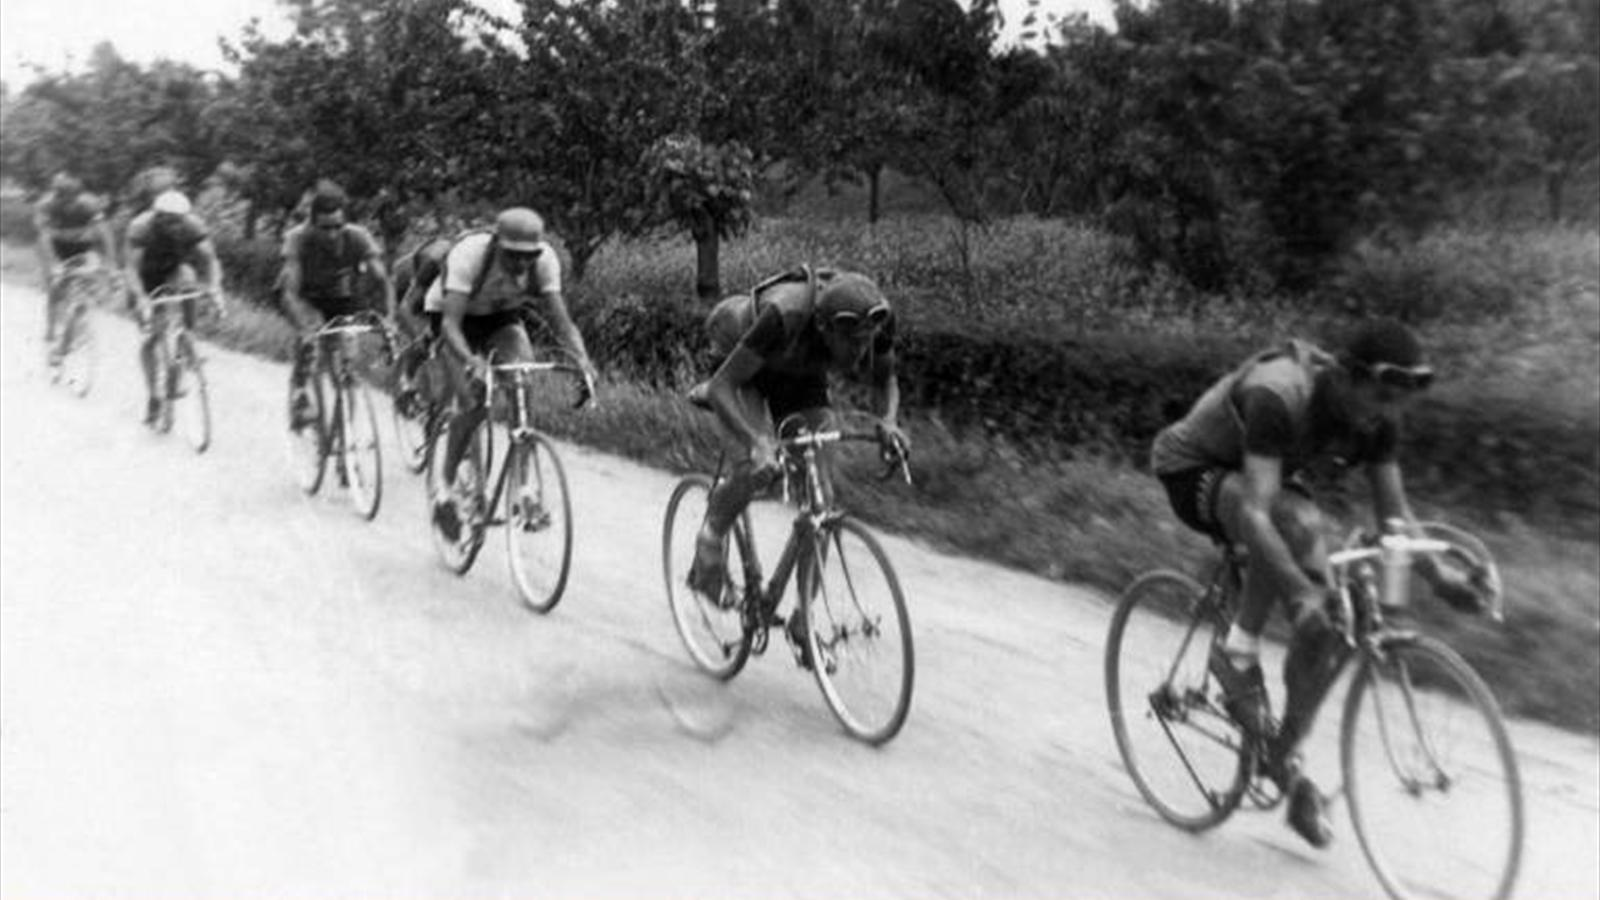 Sykkelens gyldne era